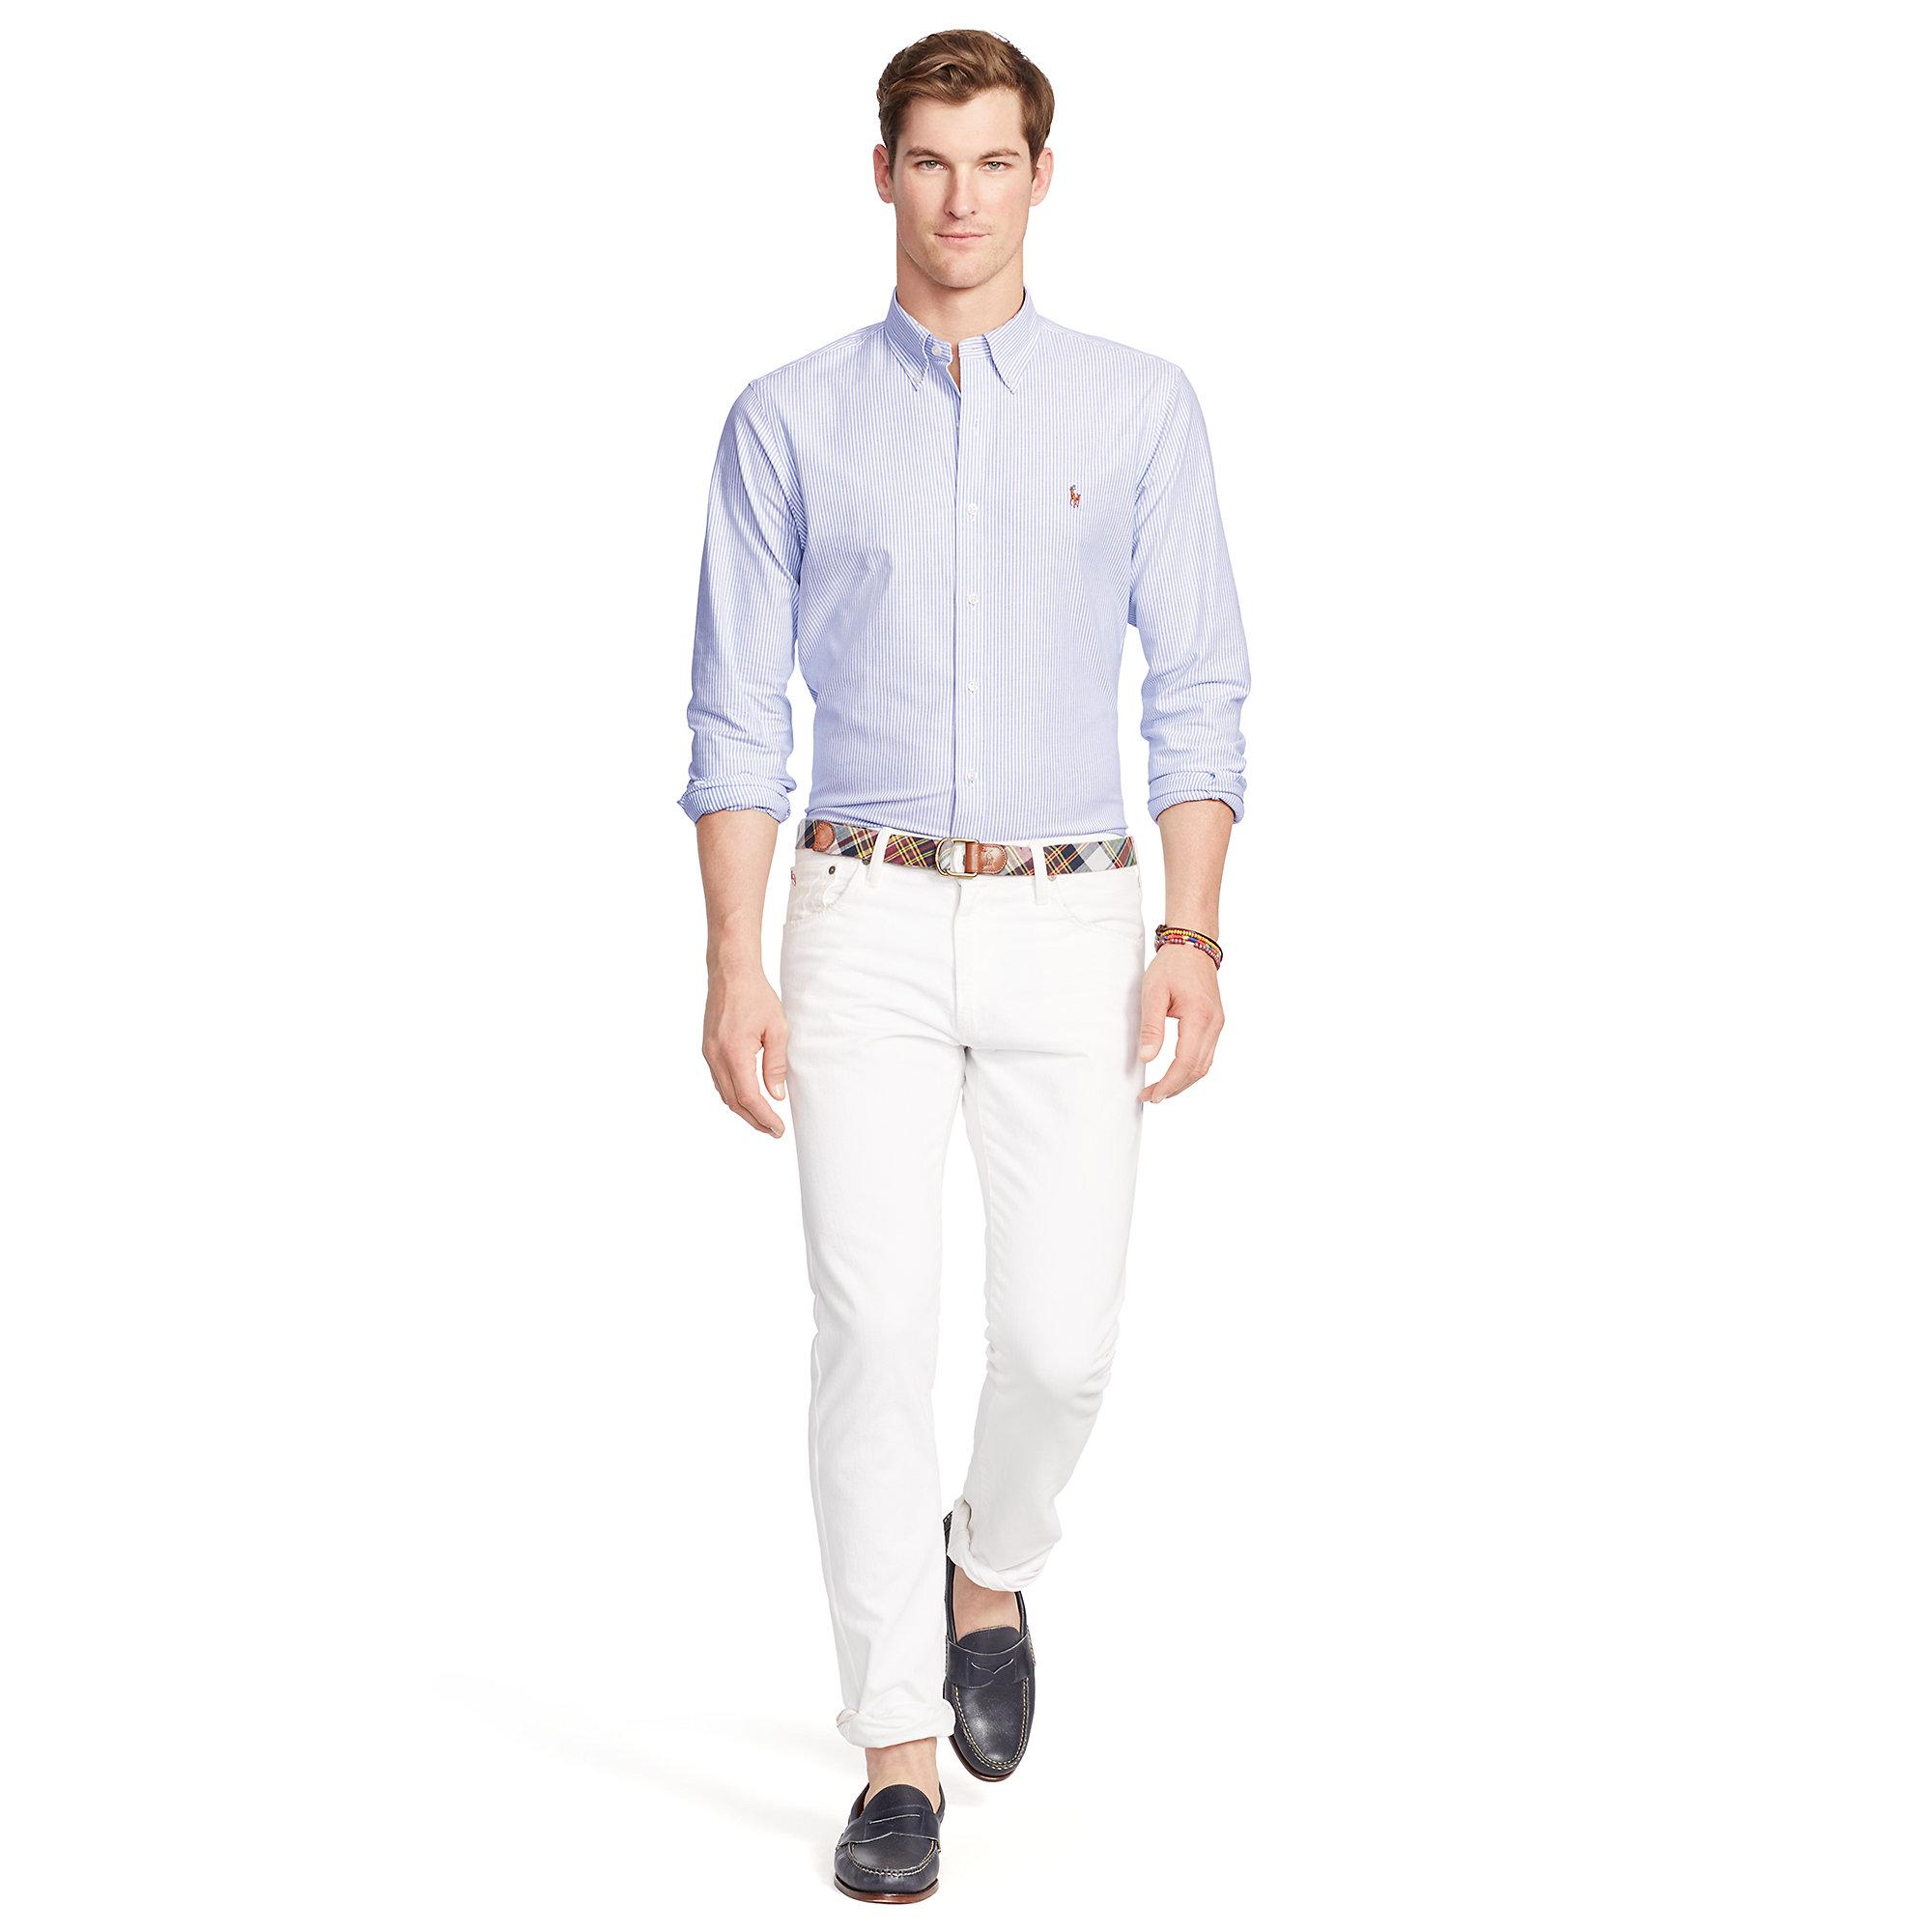 b8138820c4 Polo Ralph Lauren Slim-fit Stretch Oxford Shirt in Blue for Men - Lyst